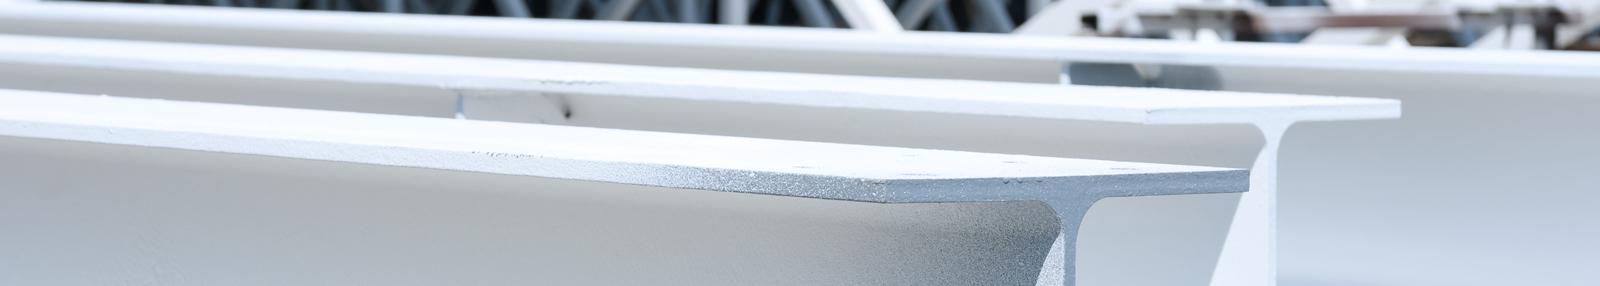 White steel elements